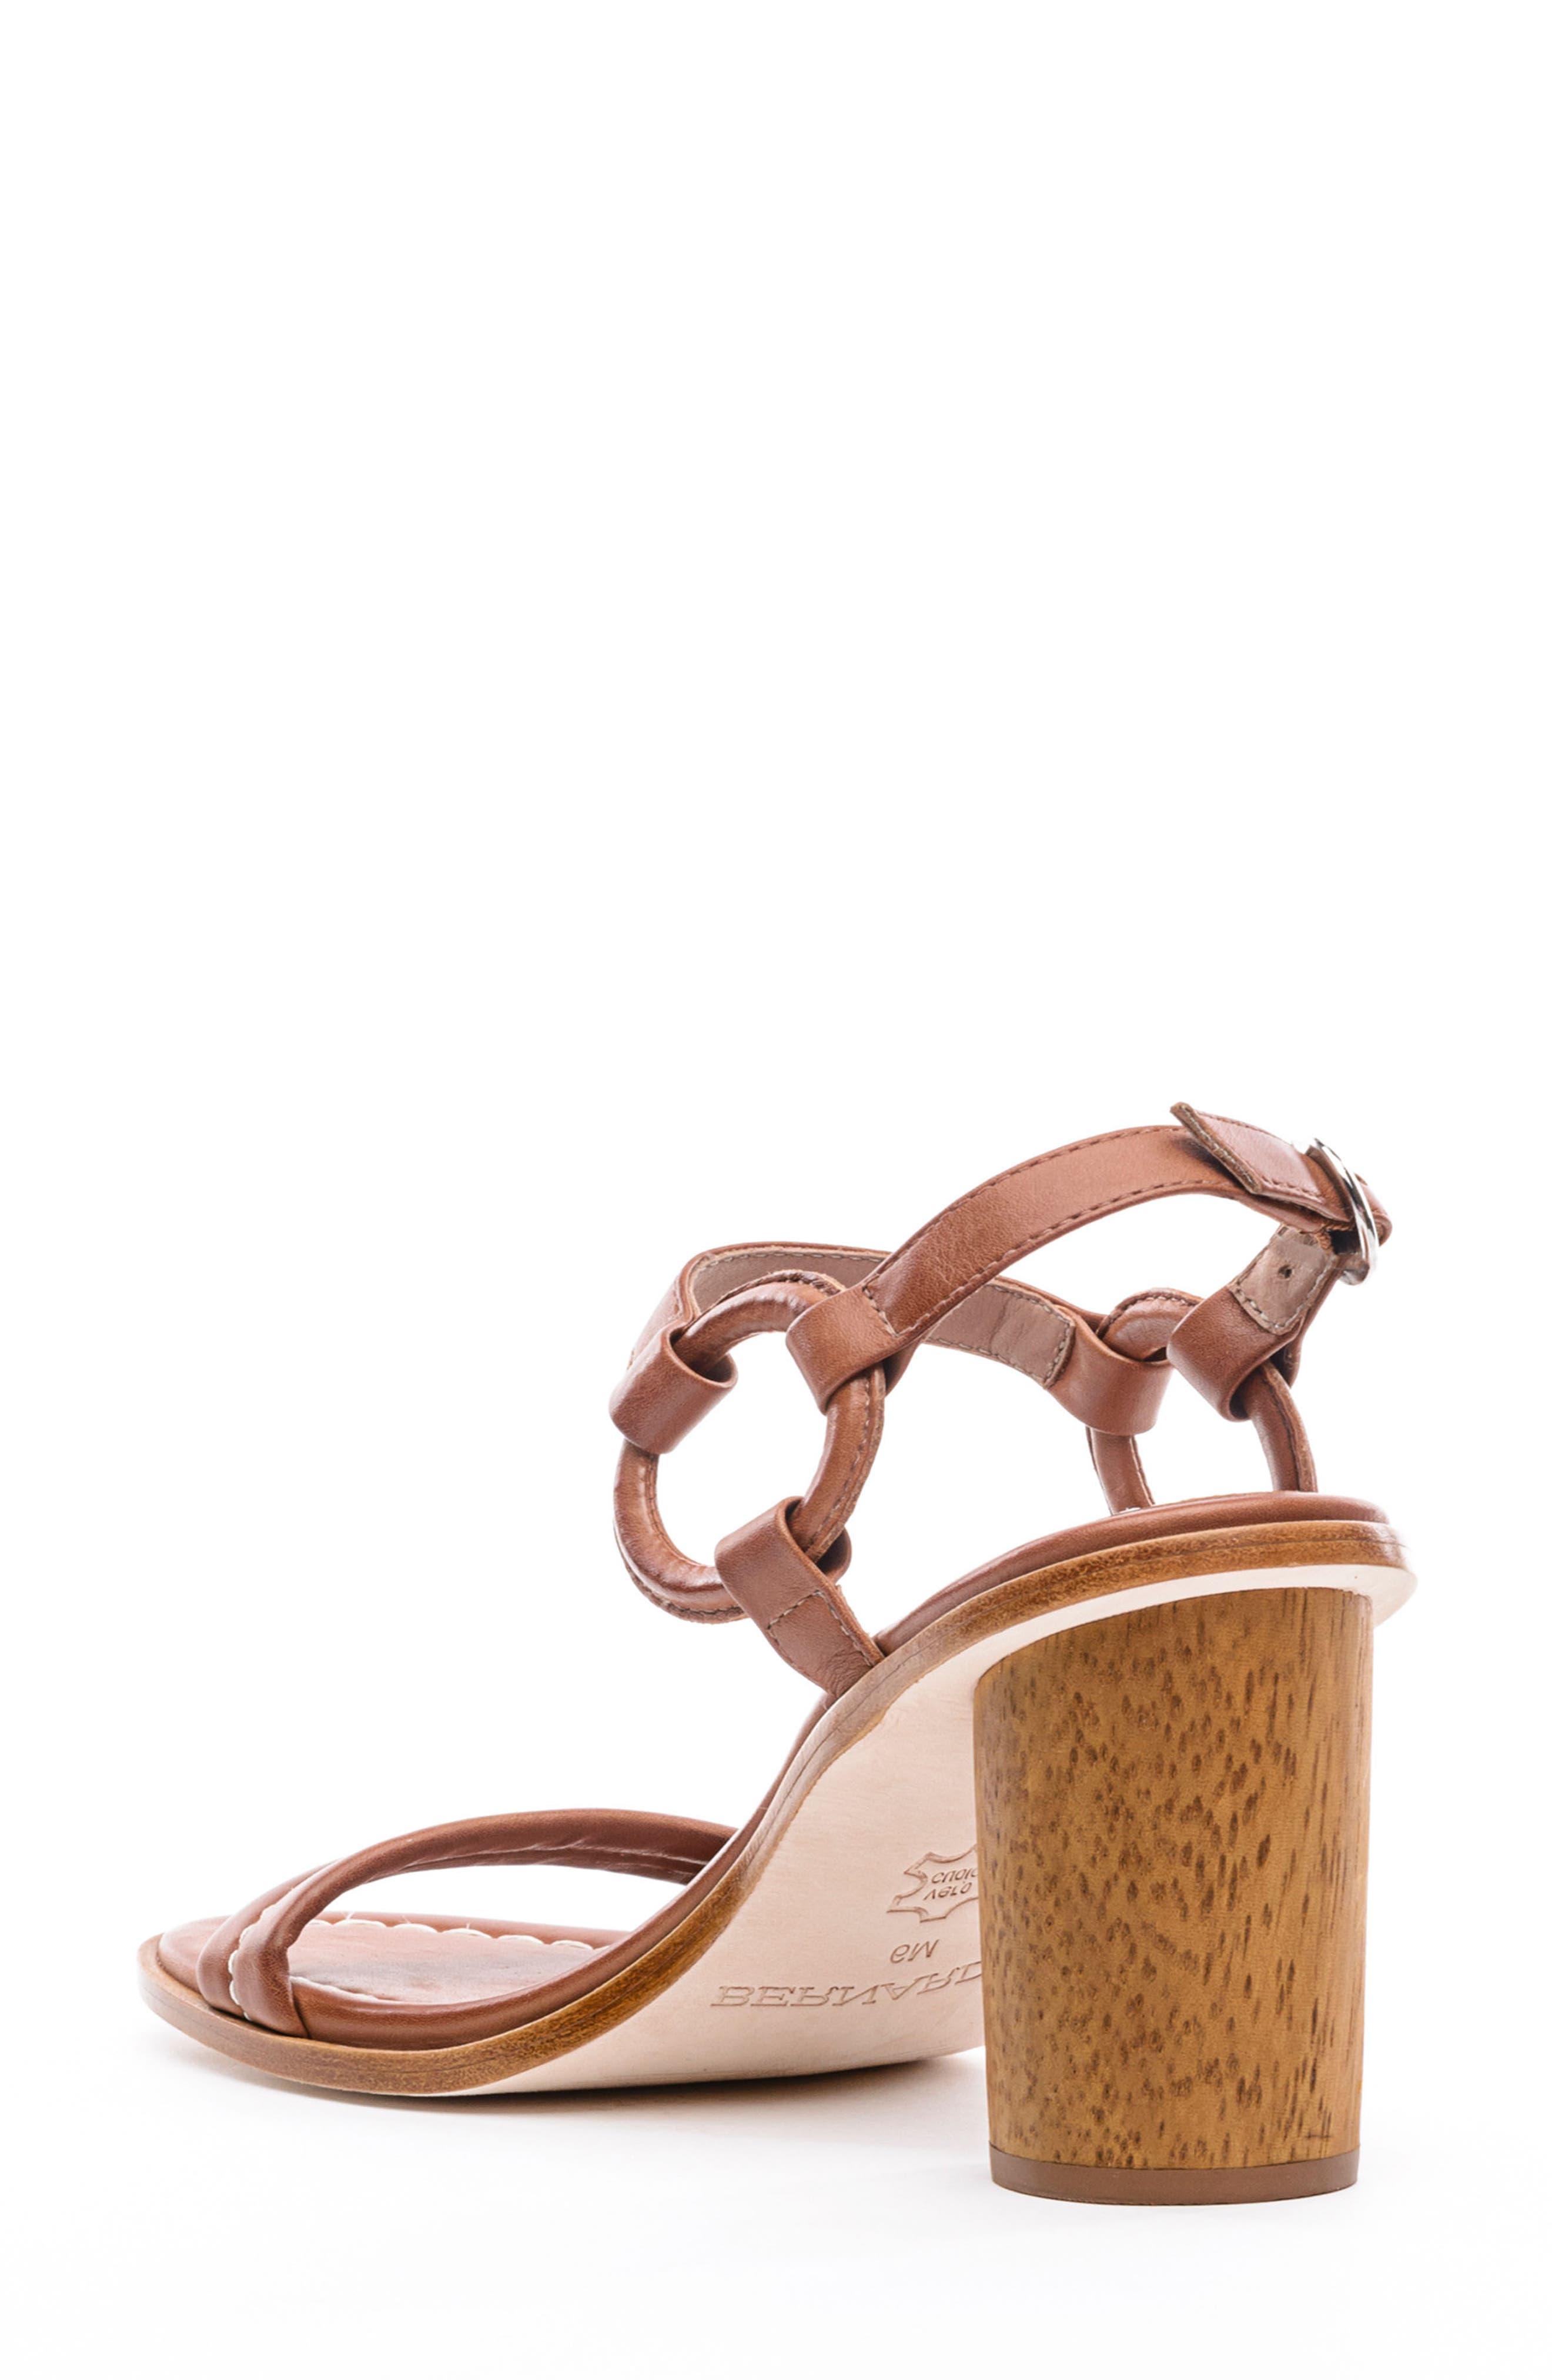 BERNARDO, Harlow Ankle Strap Sandal, Alternate thumbnail 2, color, LUGGAGE LEATHER